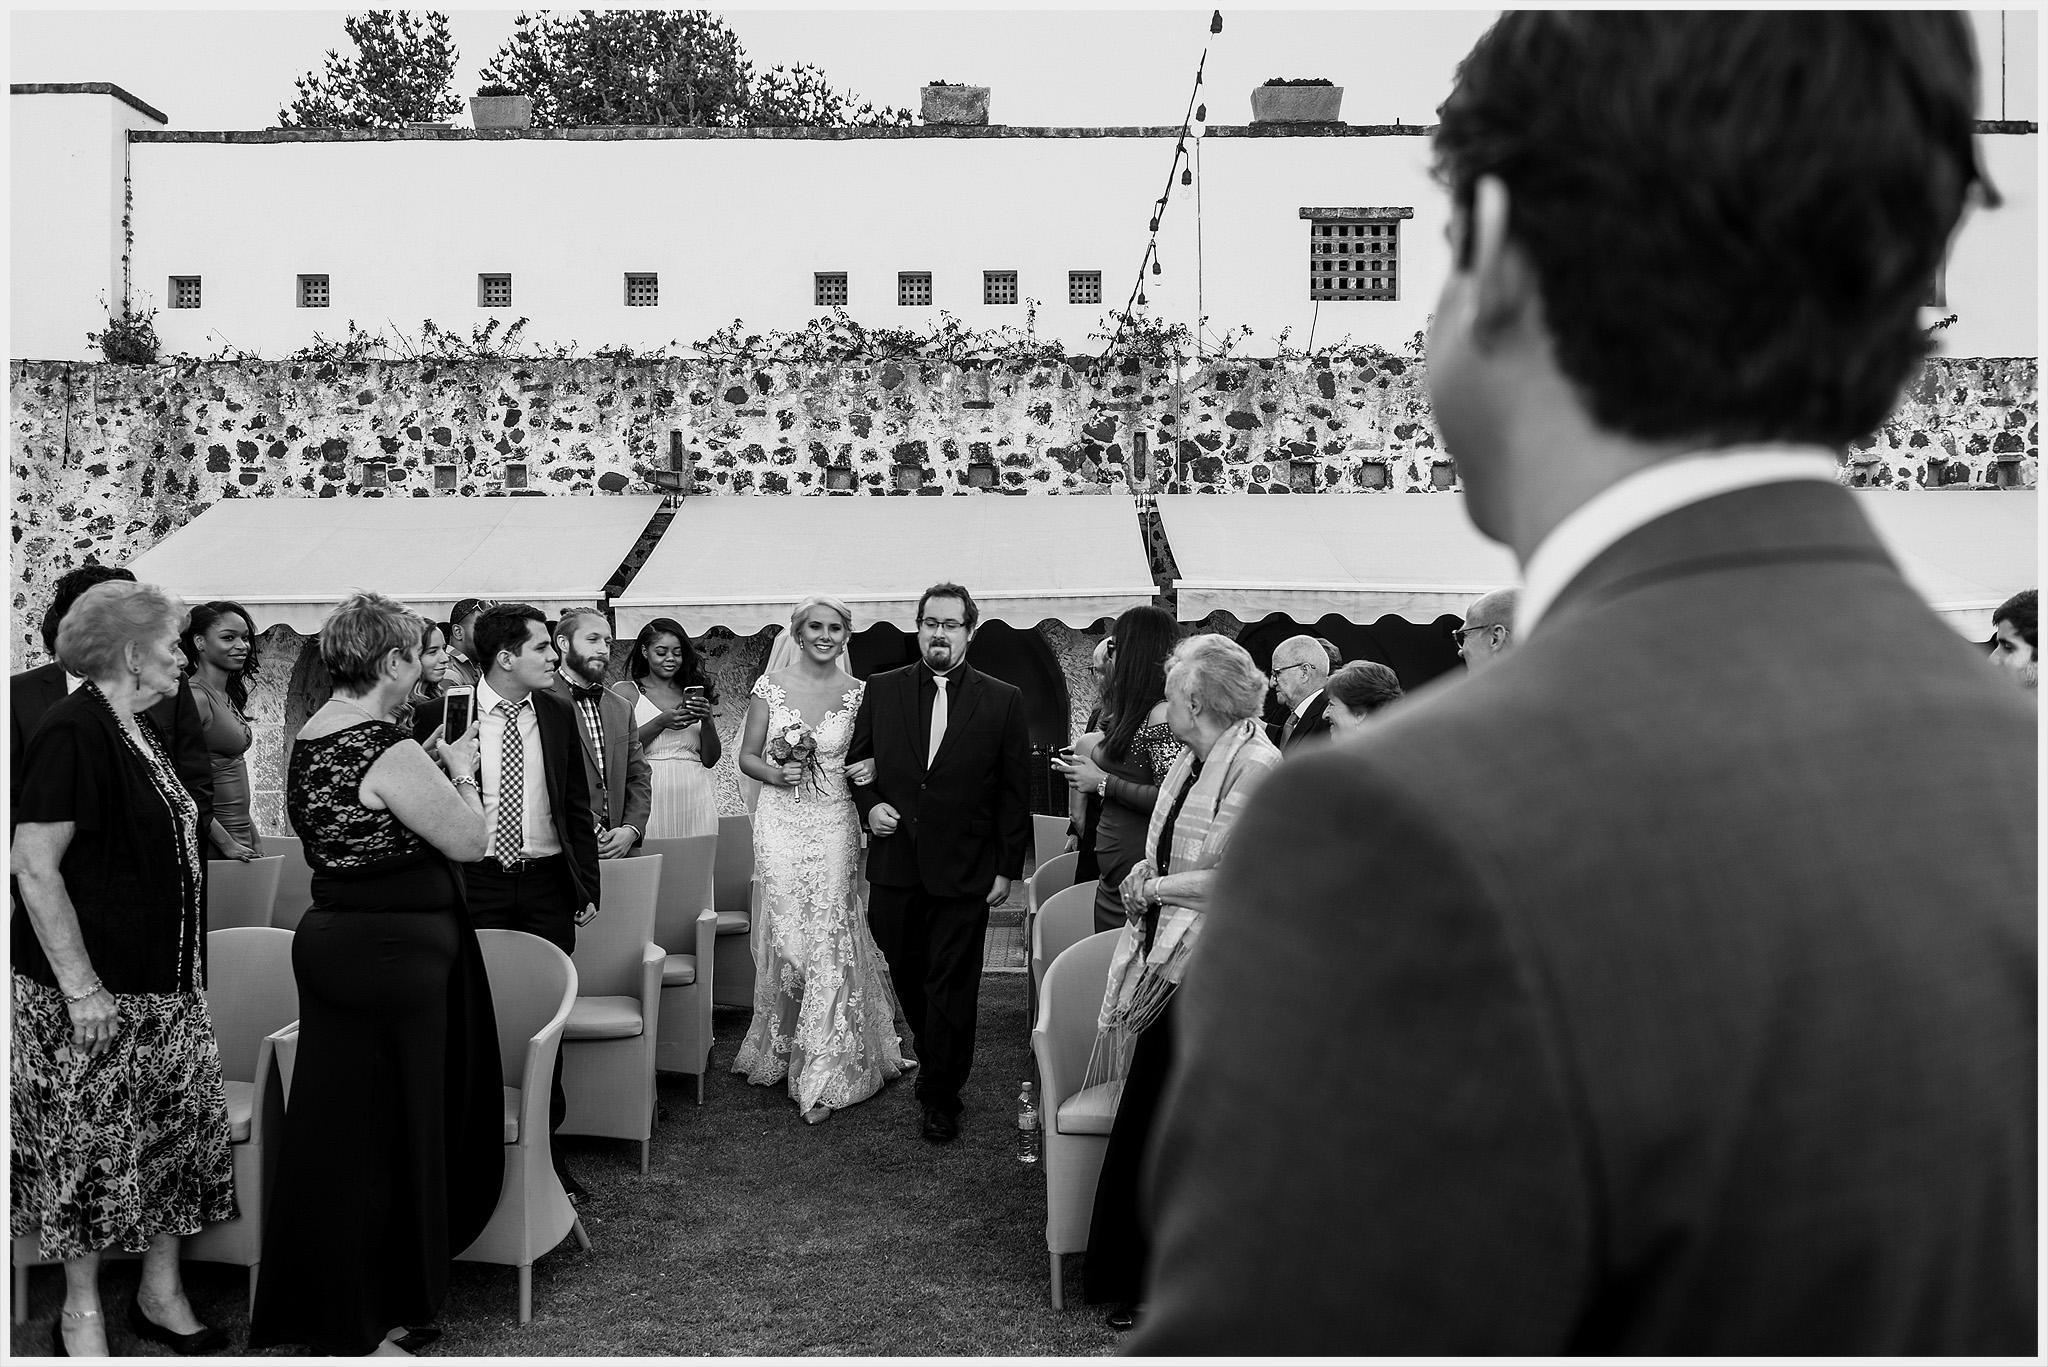 martin muriel mexico wedding_33.jpg